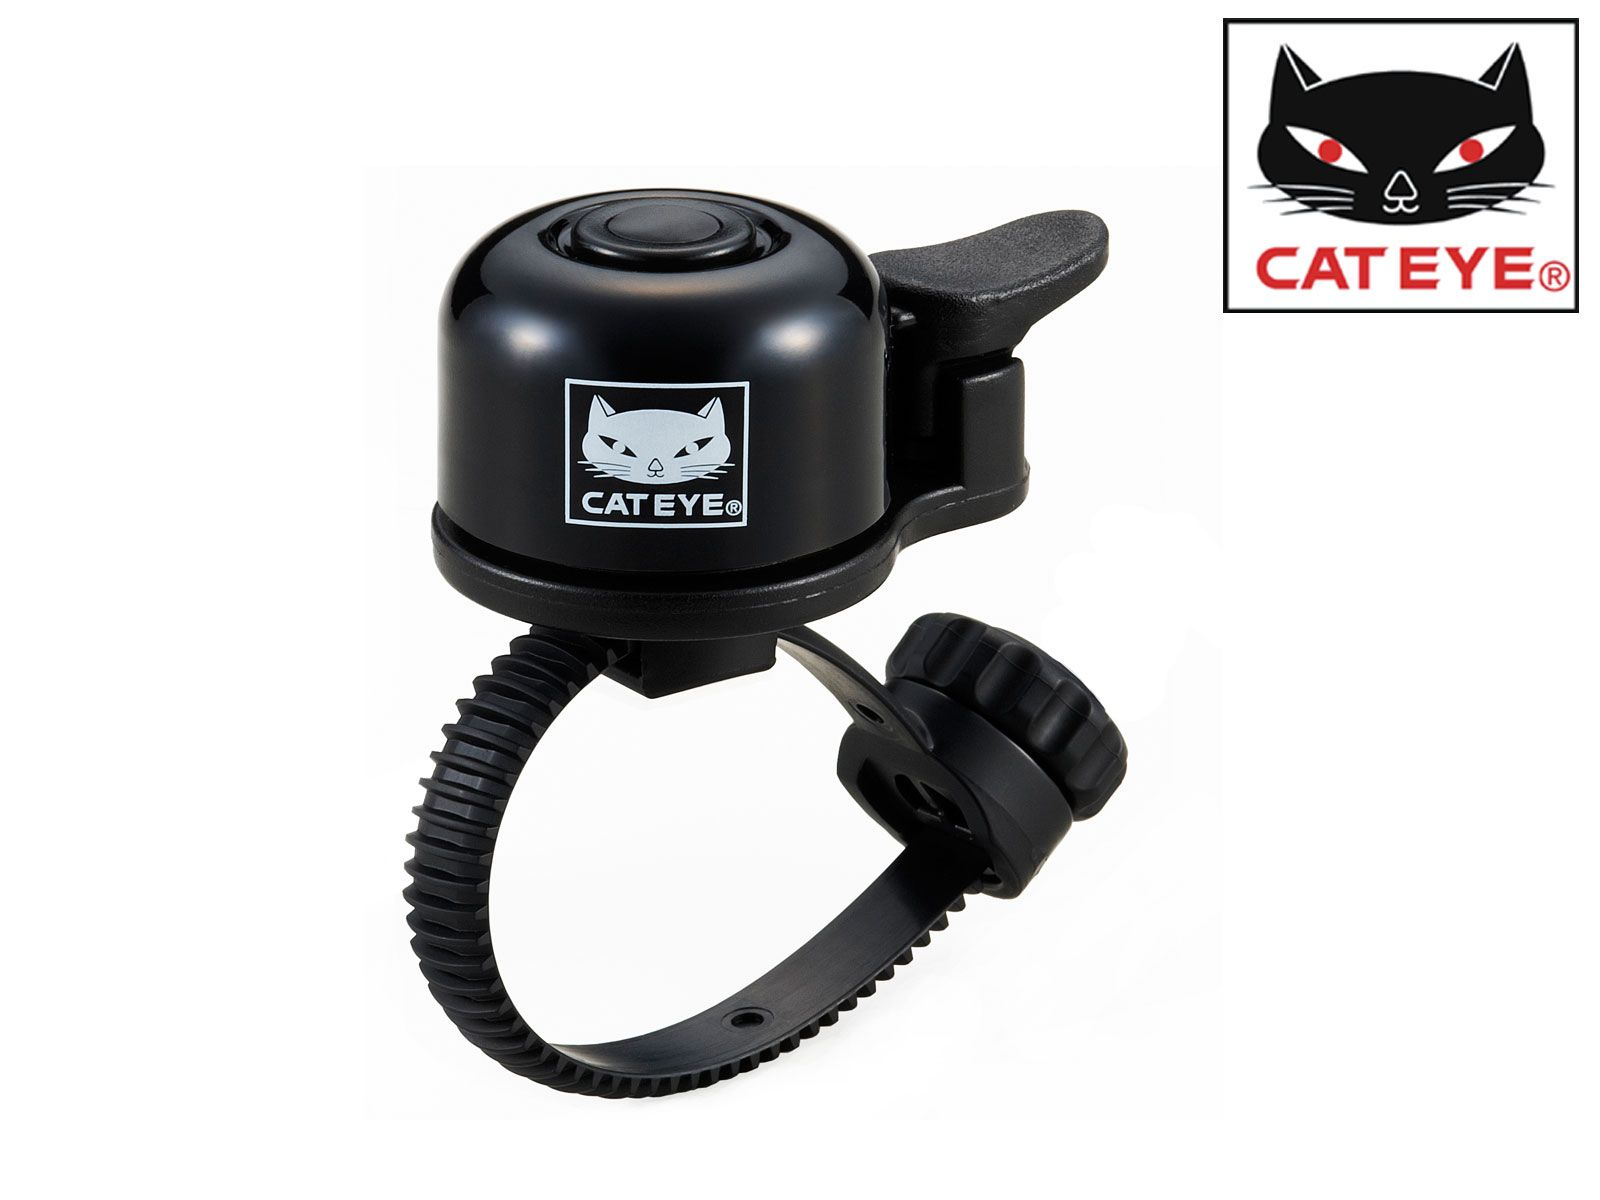 CATEYE Zvonek CAT OH-1400 (černá)